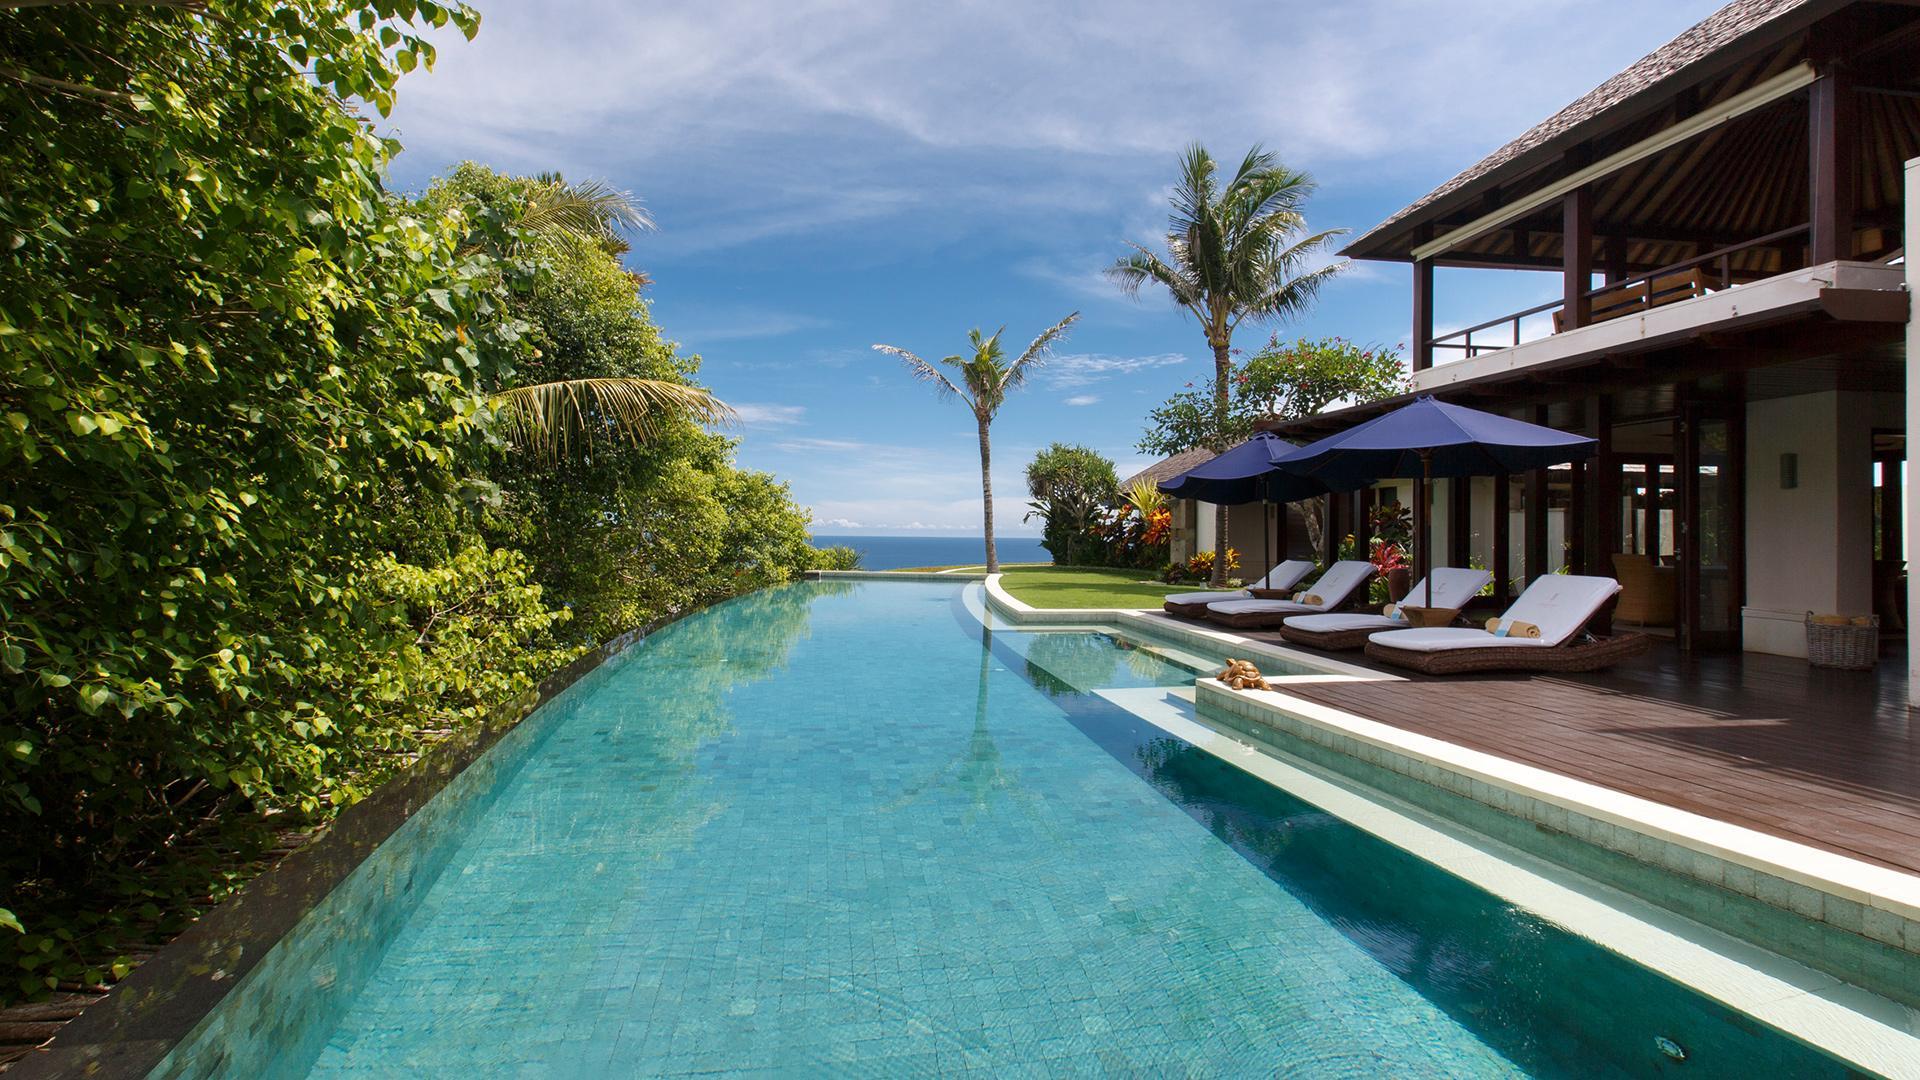 Clifftop Pool Villa Escape With Private Butler And Vip Beach Club Access Uluwatu Bali